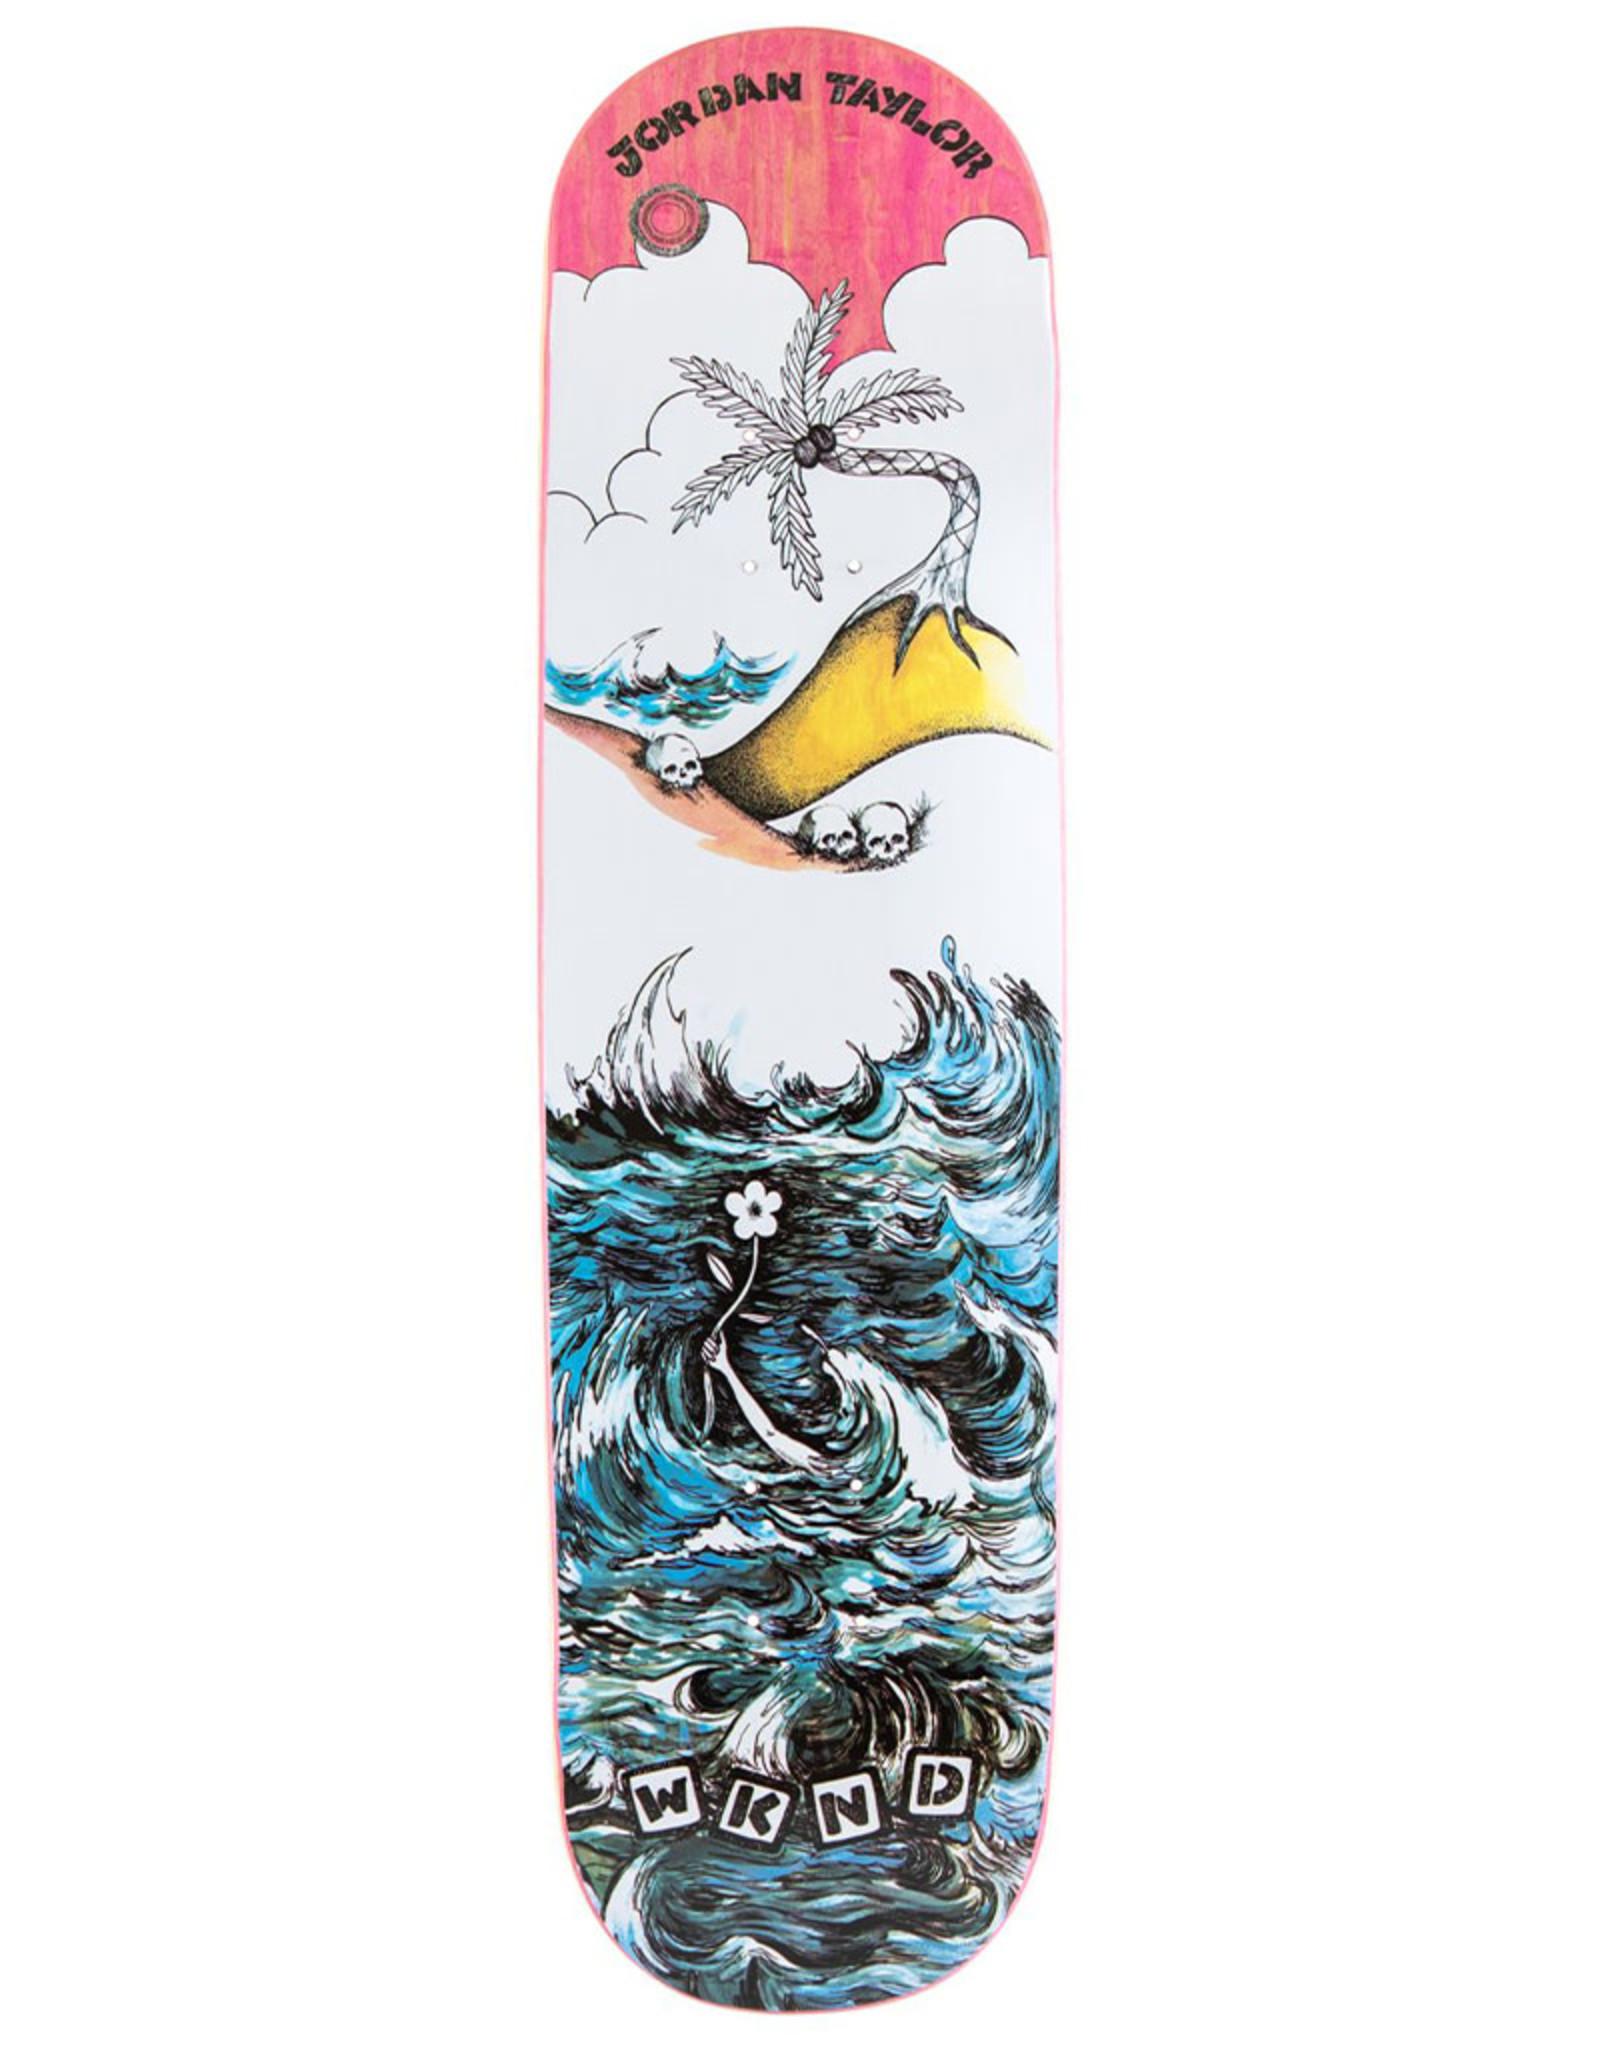 Wknd Skateboards Wknd Deck Jordan Taylor Water (8.25)